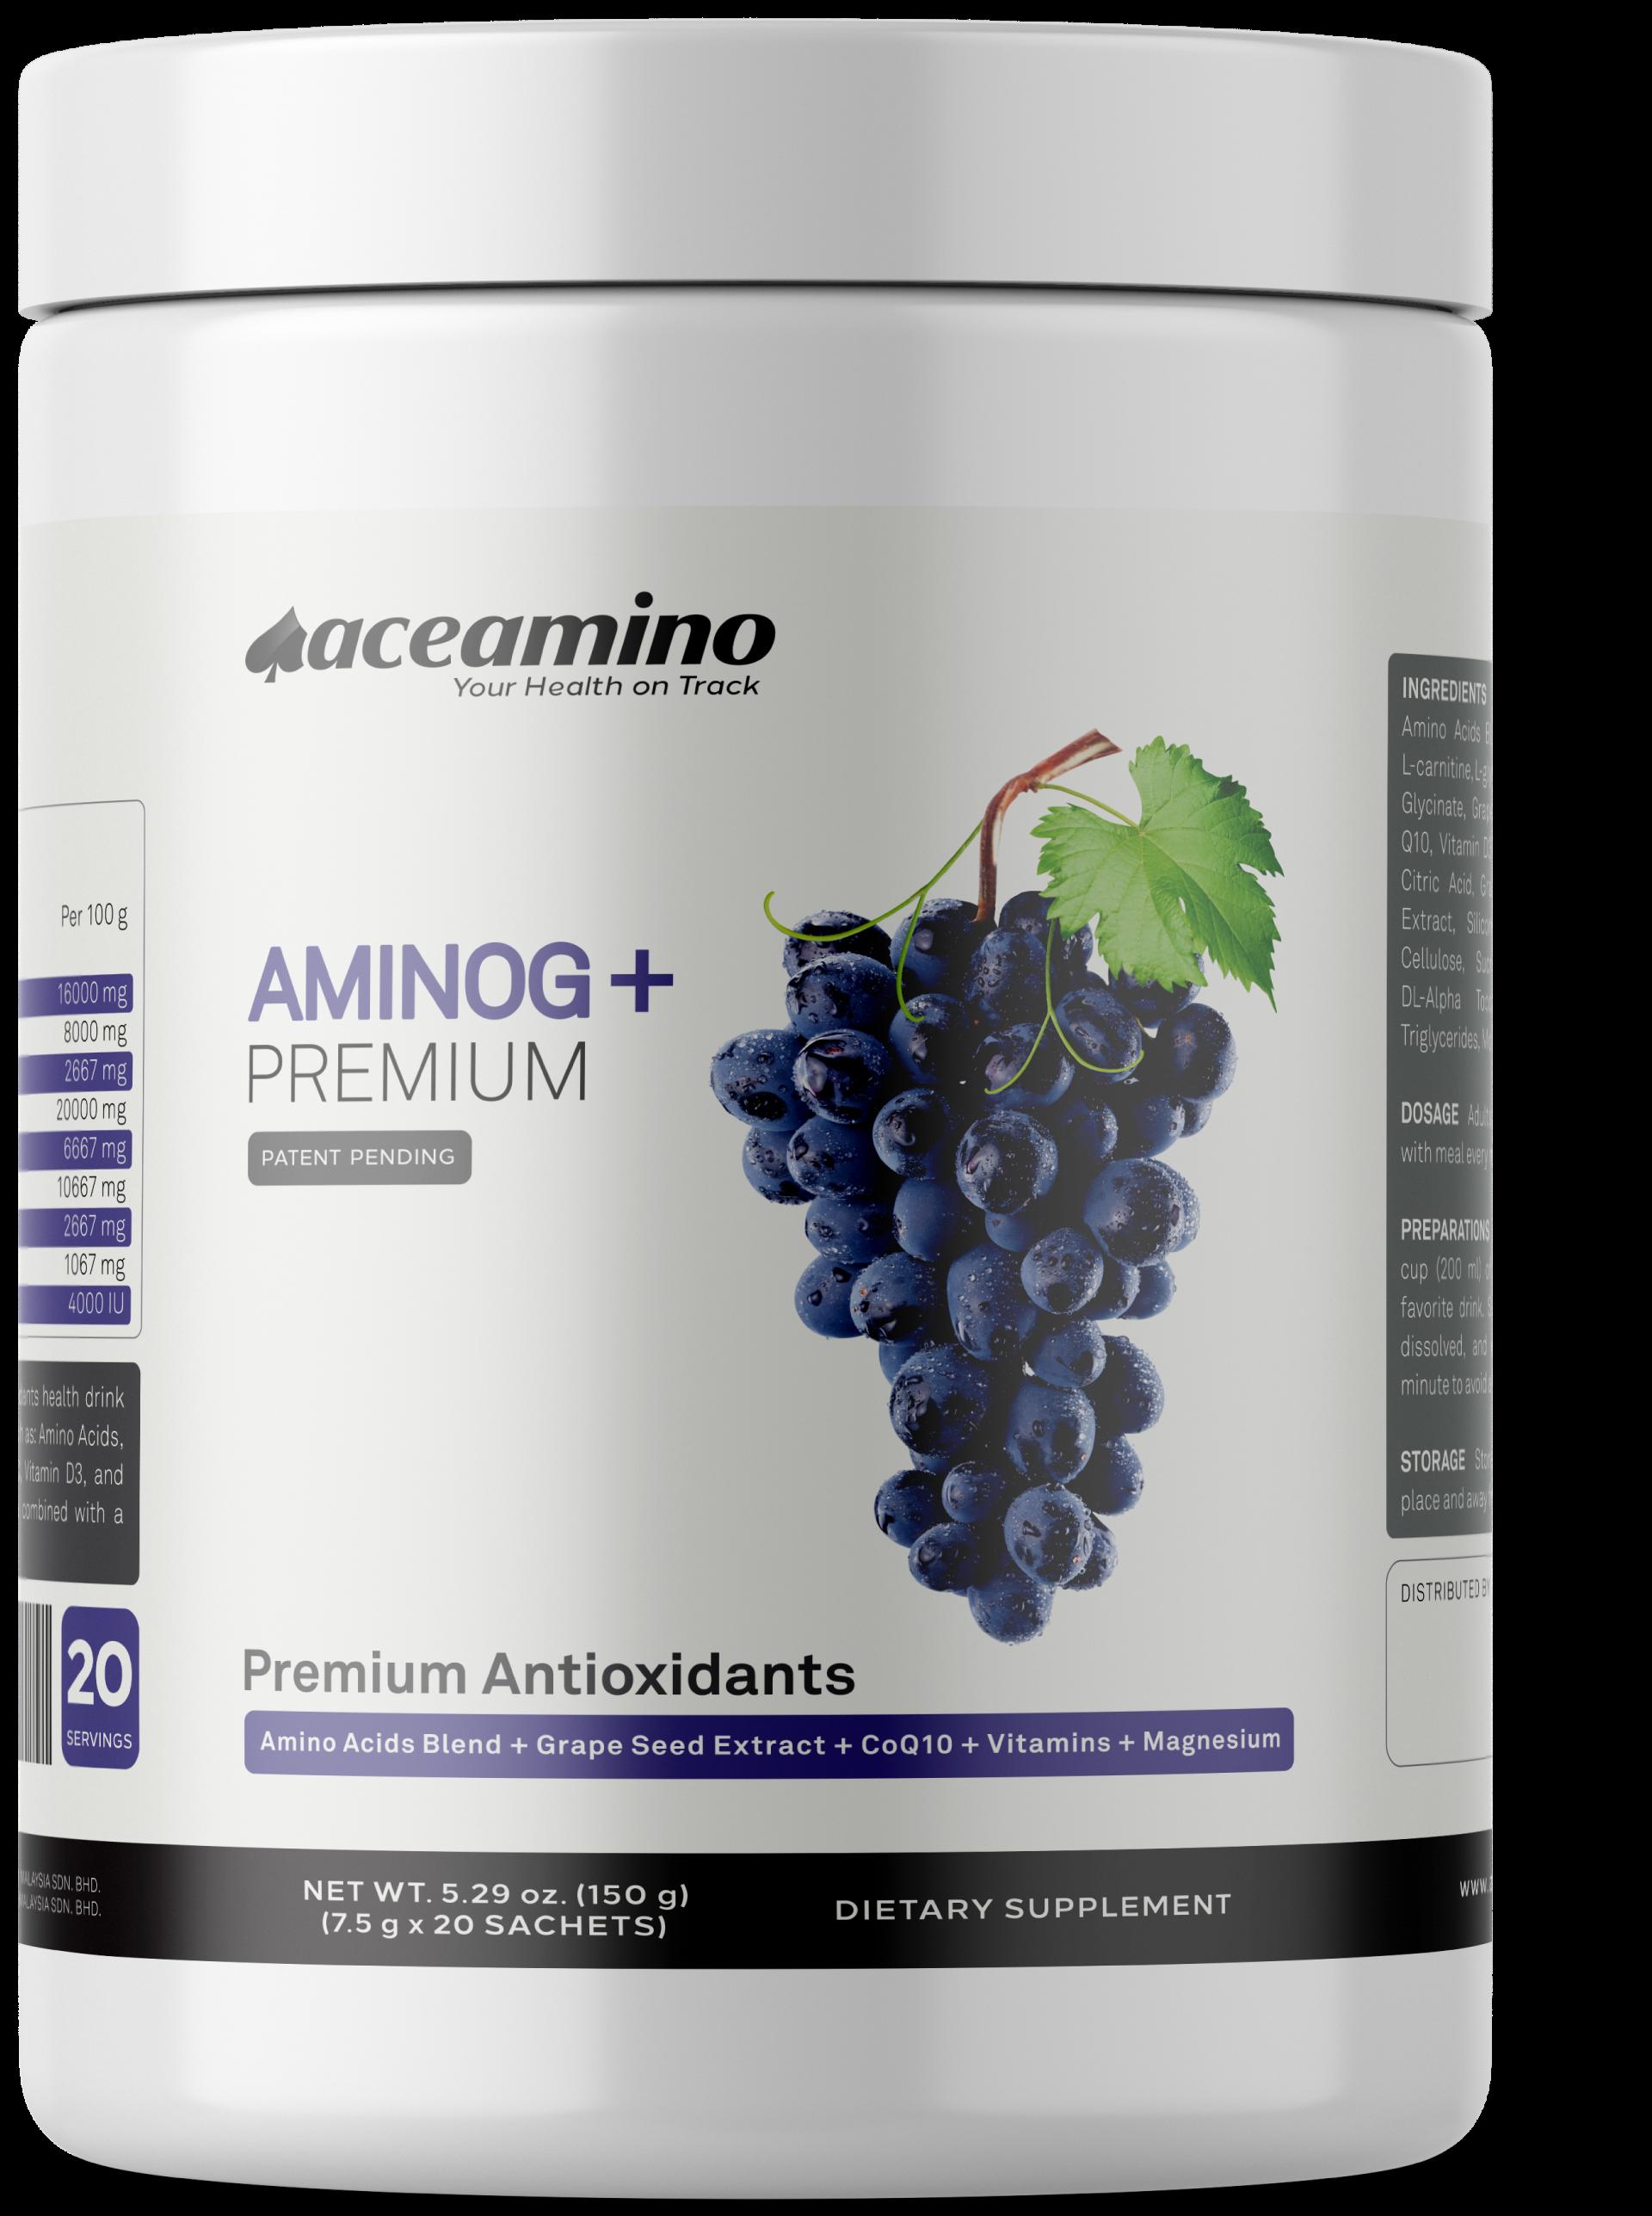 https://aceamino.com/wp-content/uploads/2018/08/aminog-1920.png